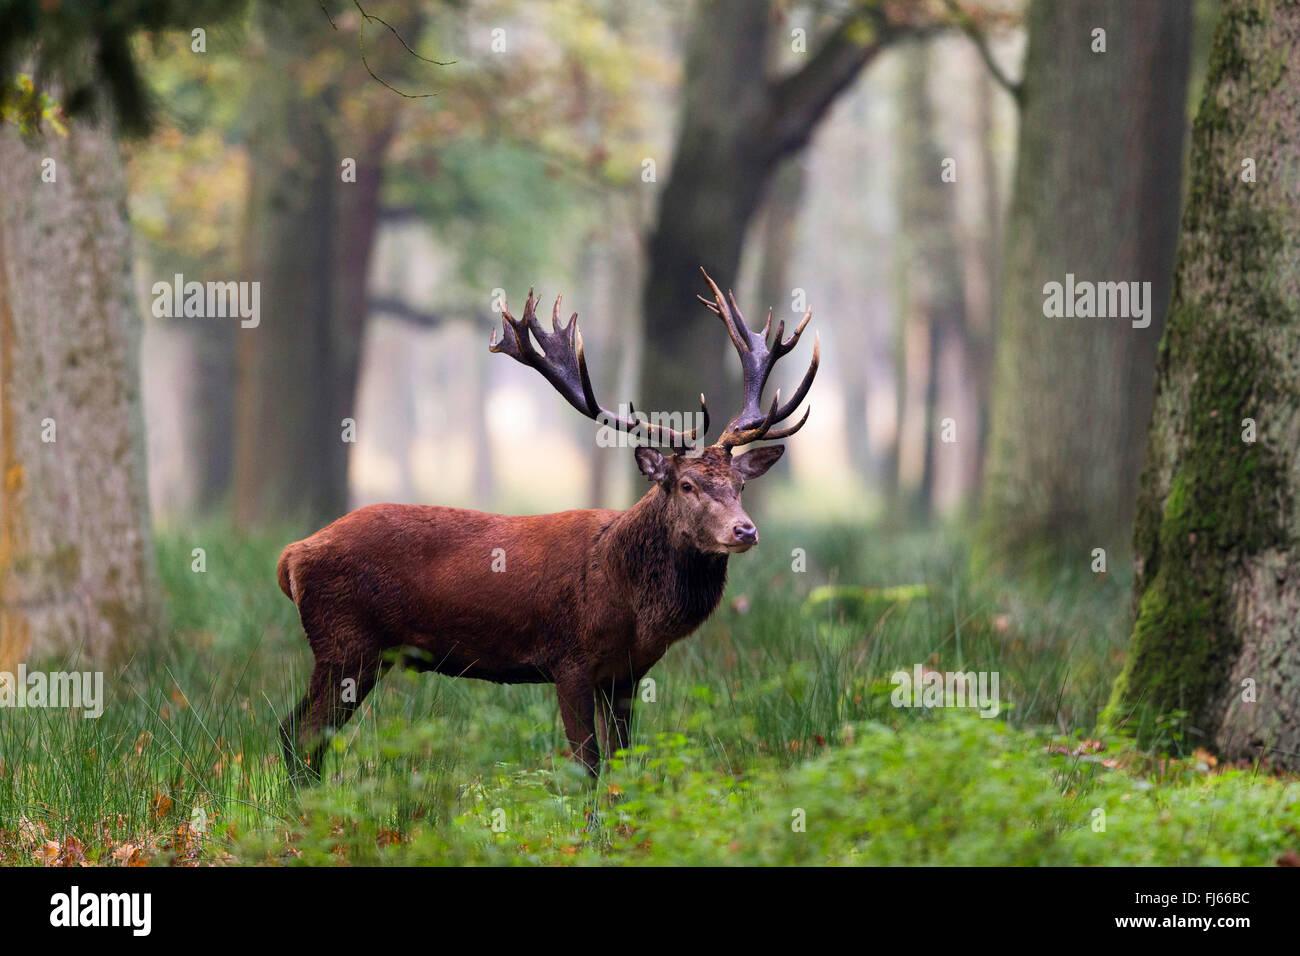 red deer (Cervus elaphus), stag in forest, Germany, North Rhine-Westphalia - Stock Image